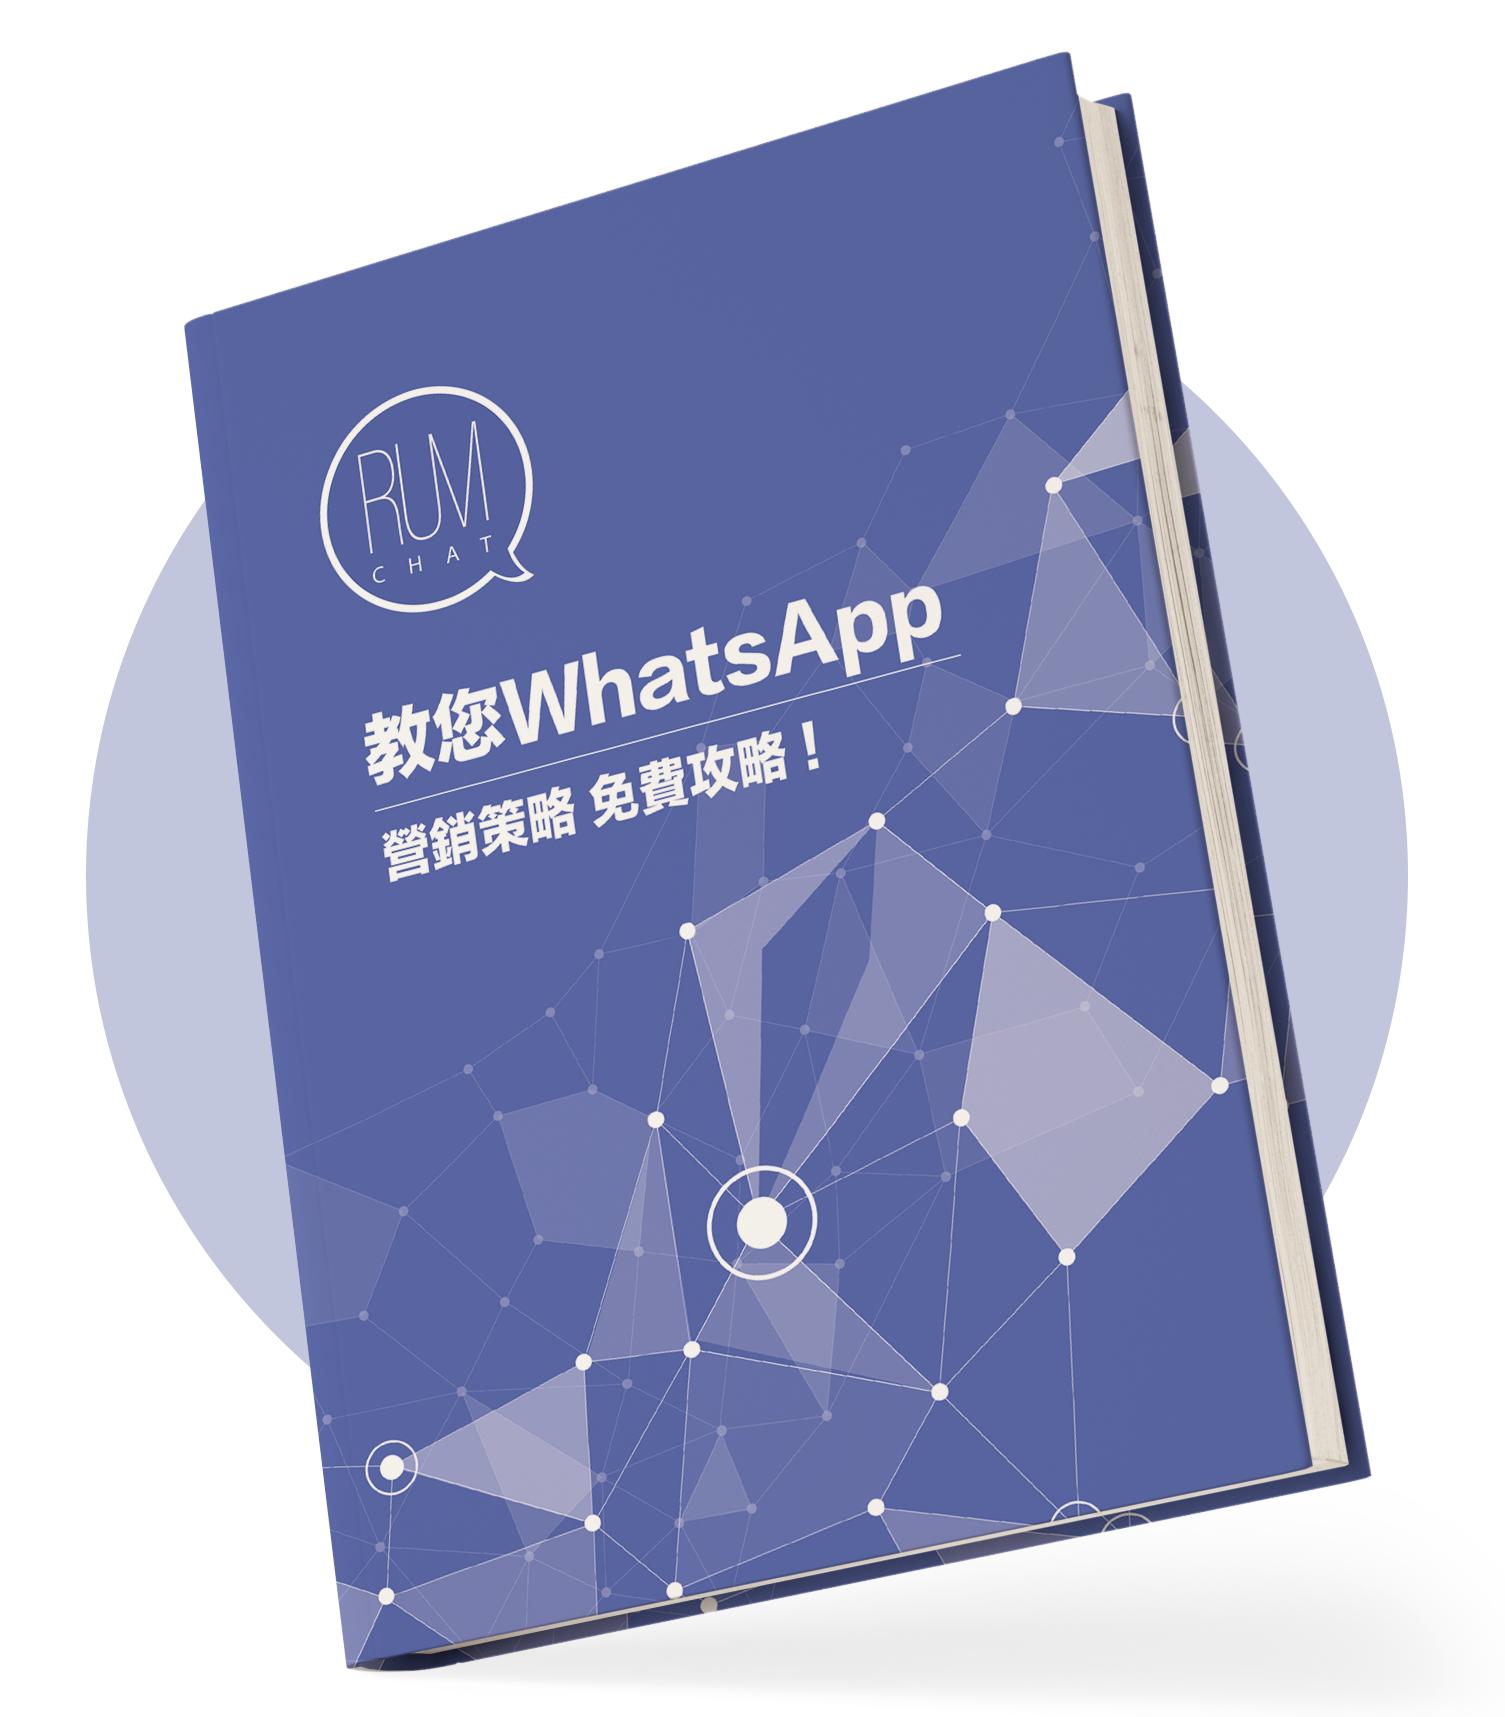 WhatsApp API marketing guide